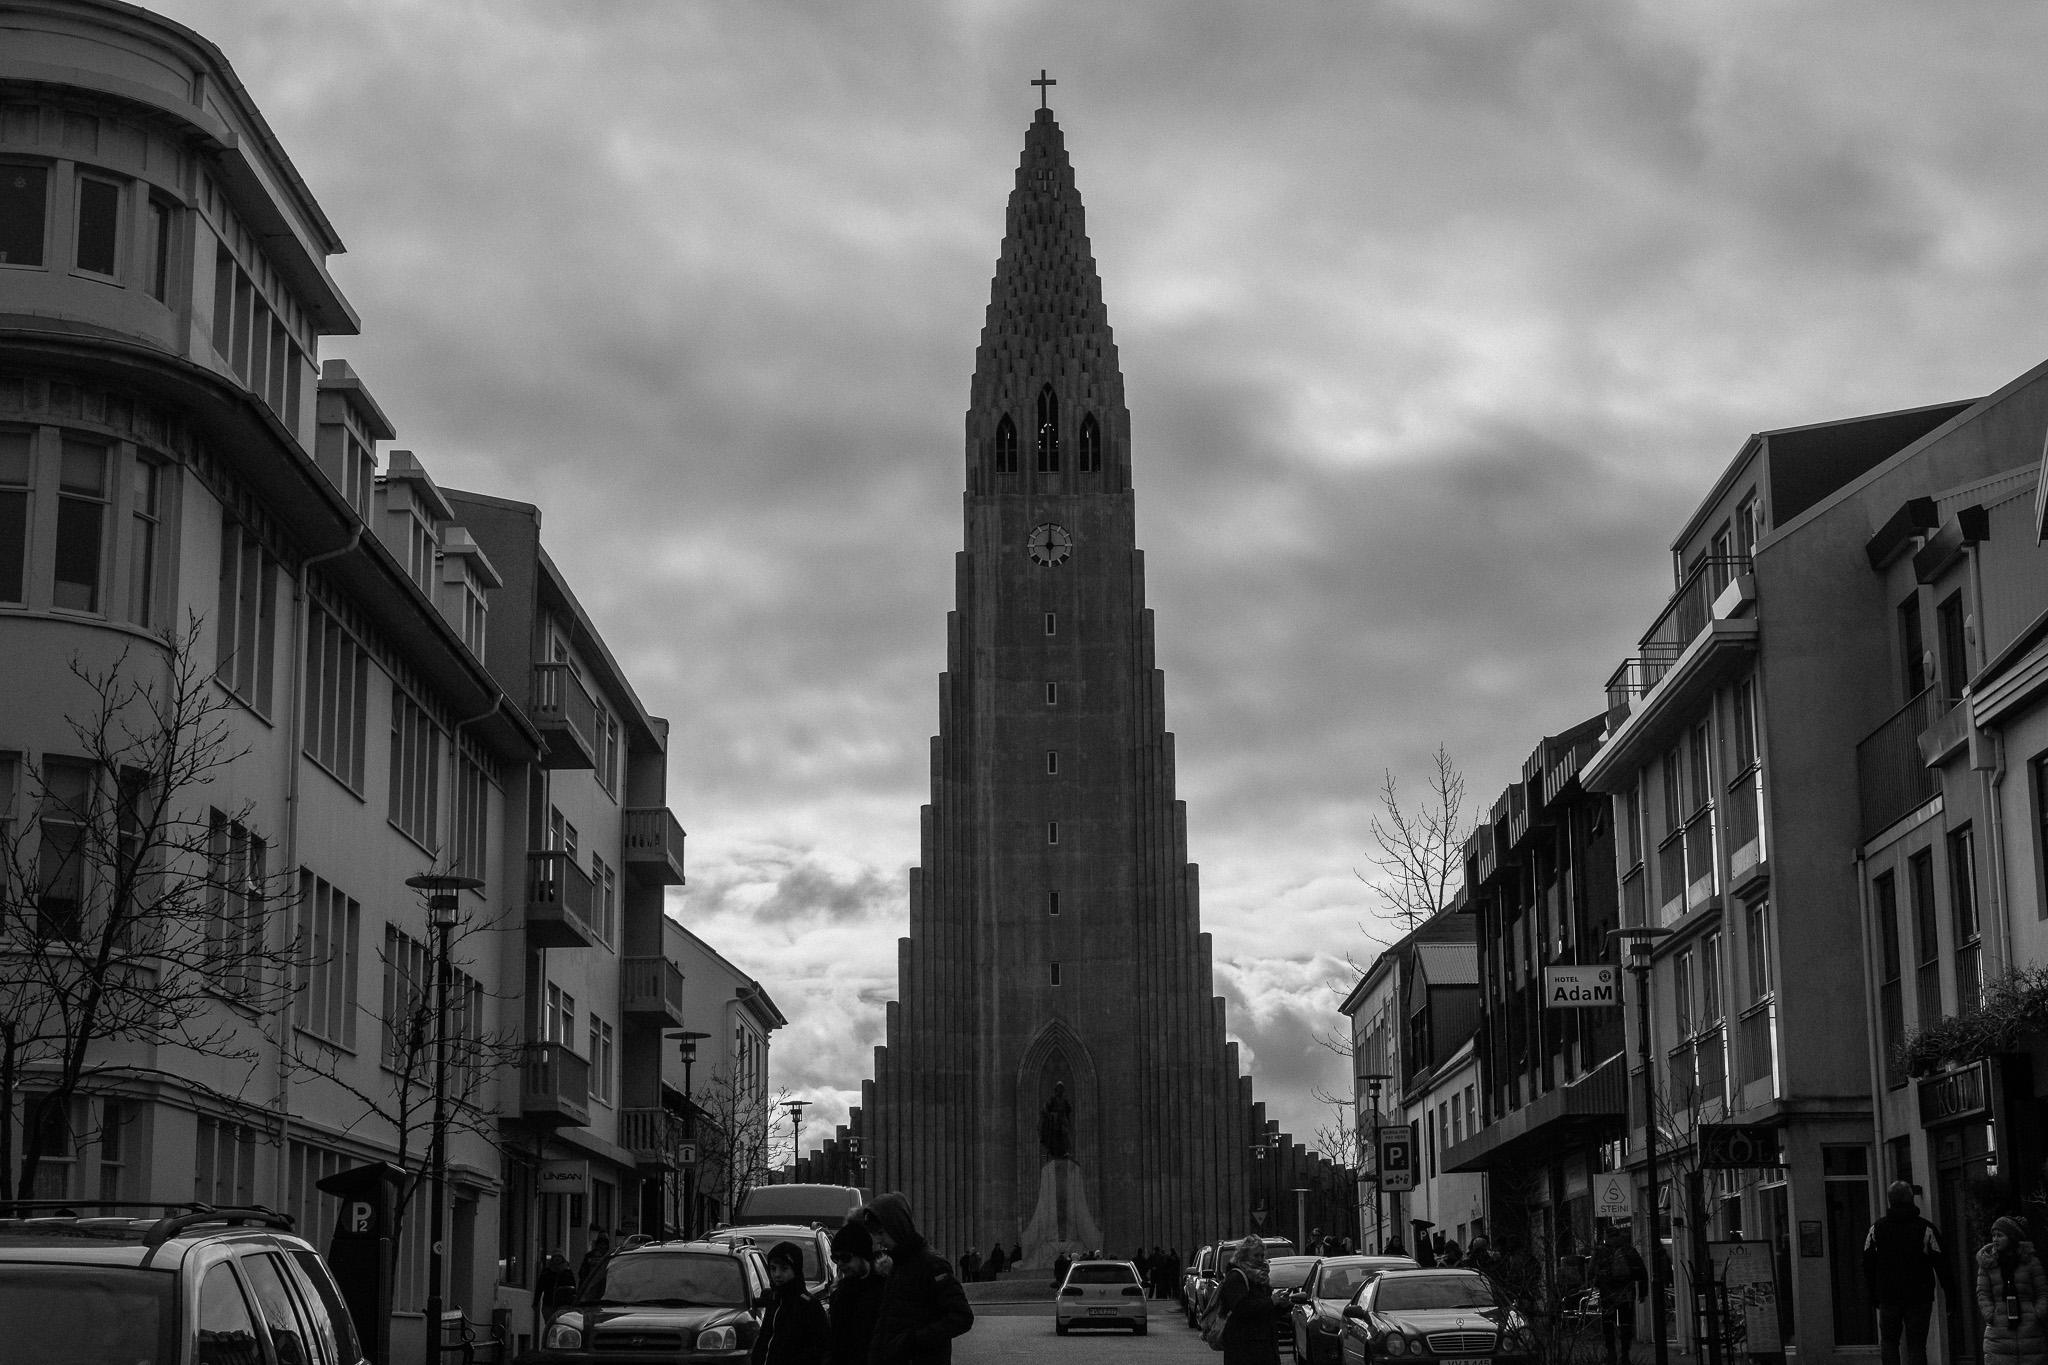 20170409190006_Iceland_By_EjunLow_2051v01.jpg